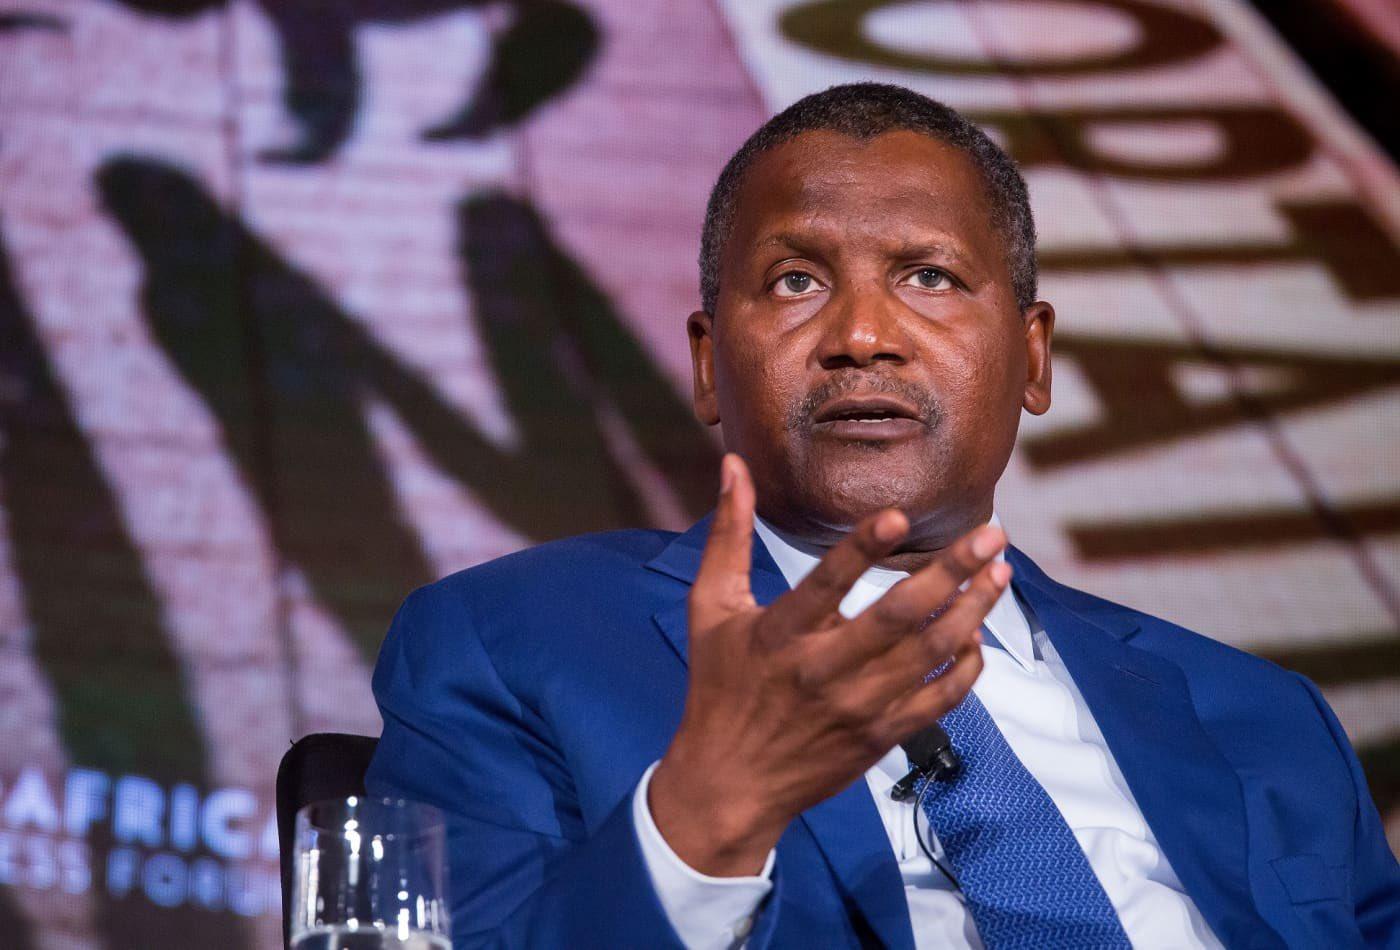 Africa's richest man, Alike Dangote